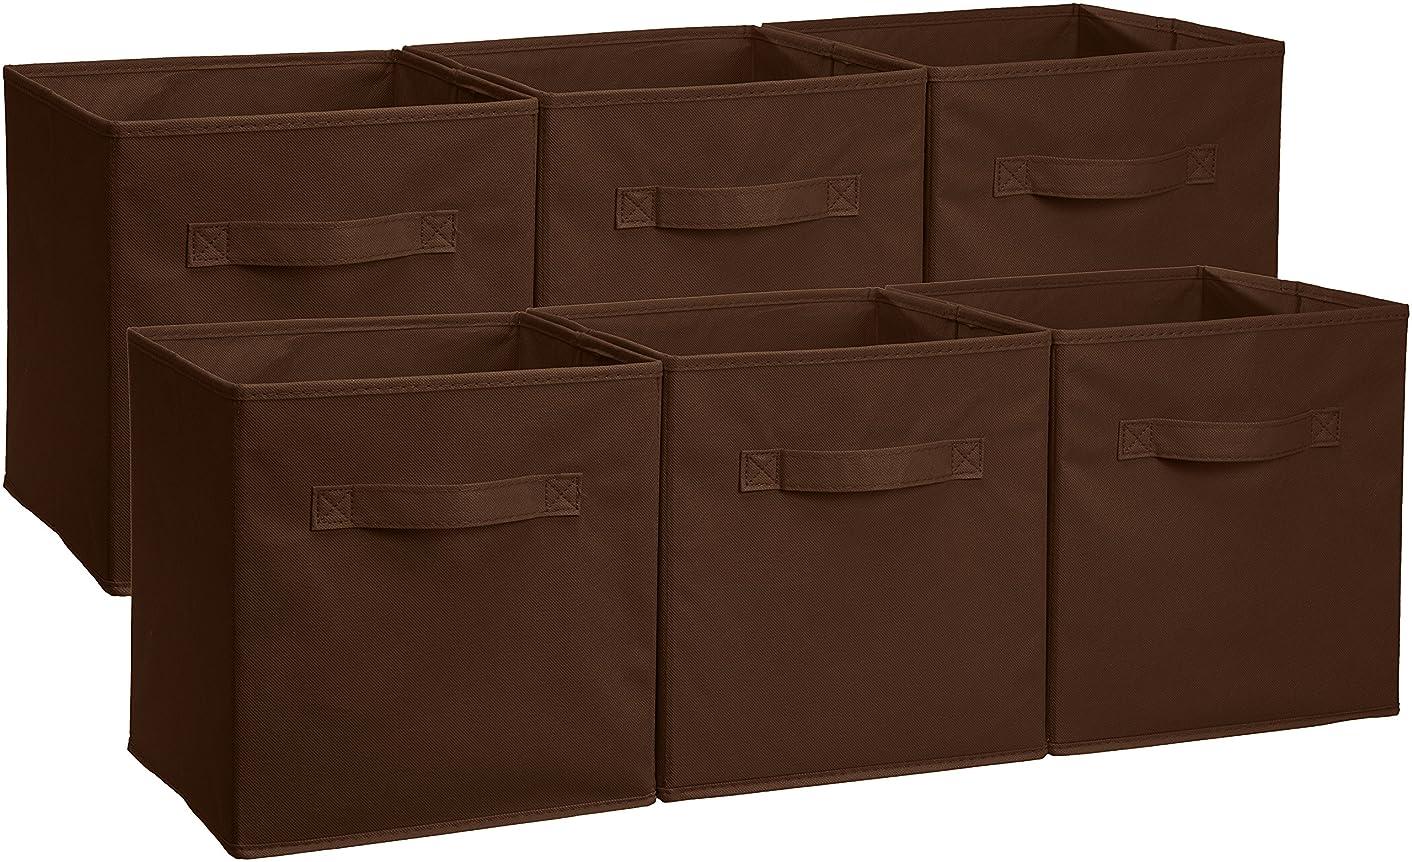 AmazonBasics Foldable Storage Bins Cubes Organizer, 6-Pack, Brown